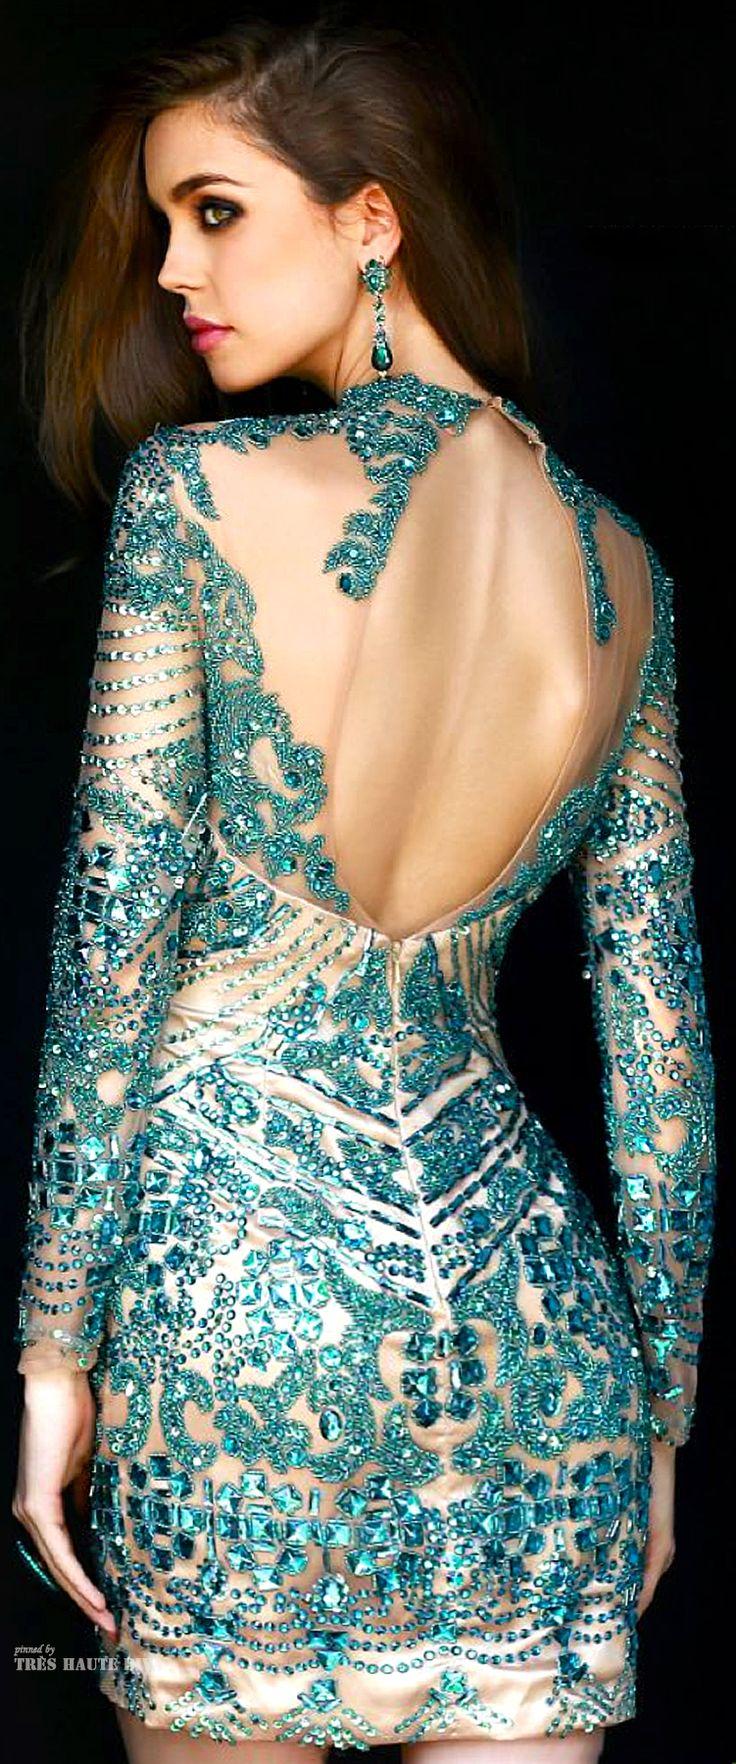 Sherri Hill Fall 2014 ♔ More dresses added daily @ https://www.pinterest.com/tanja62287/couture-dresses/